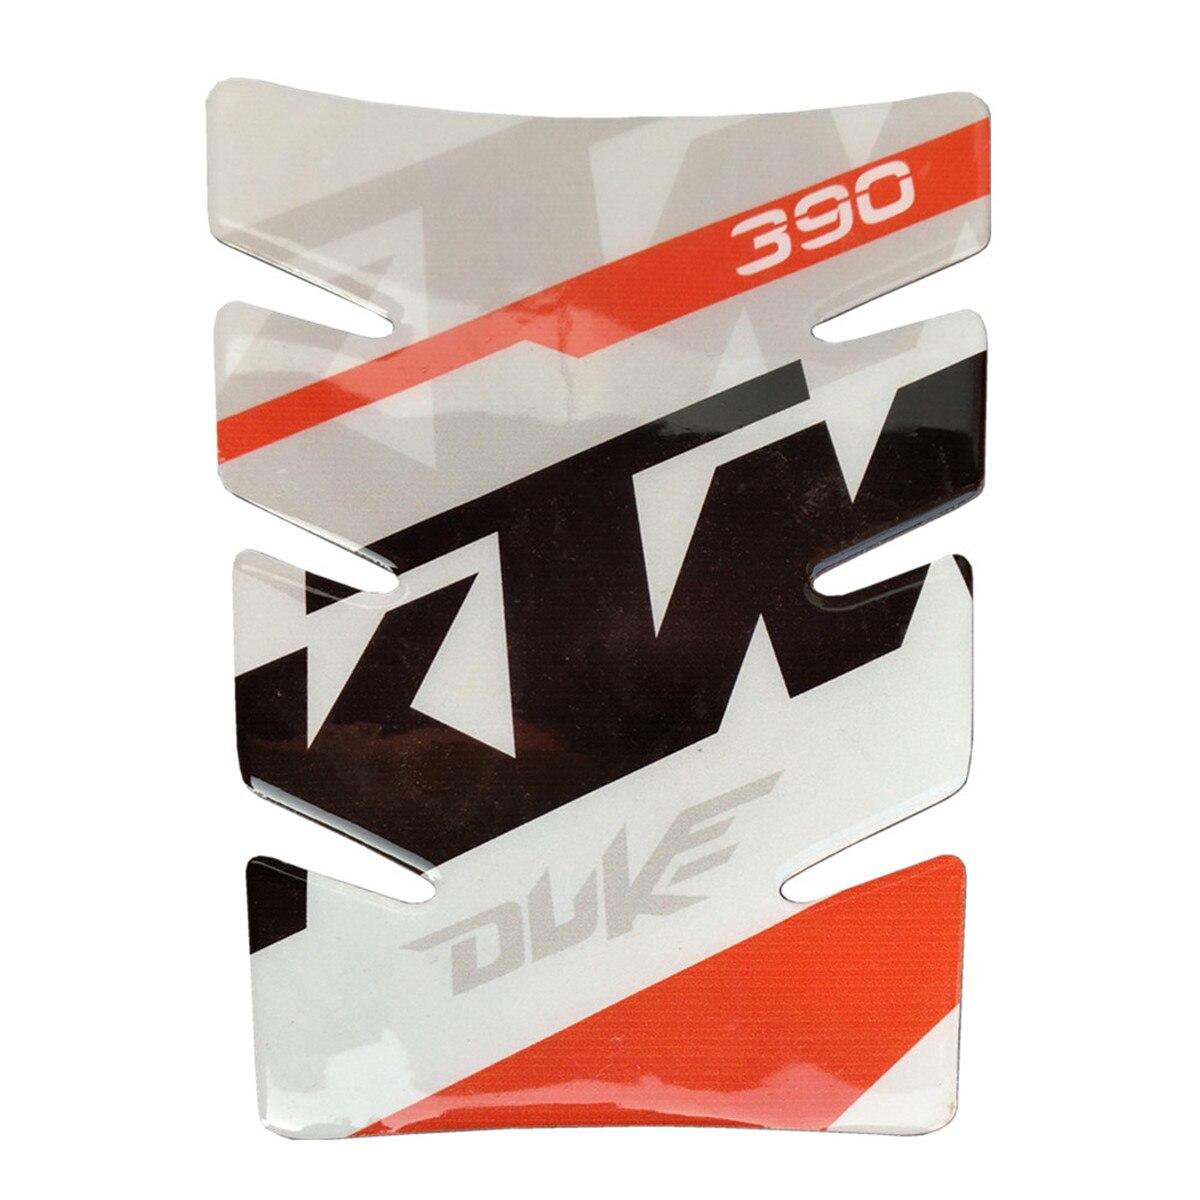 Motocicleta de alta calidad para KTM Duke 390 pegatina tipo almohadilla para depósito 3D calcomanía emblema 2018 2017 Tankpads piezas de Motor protección de motocicleta